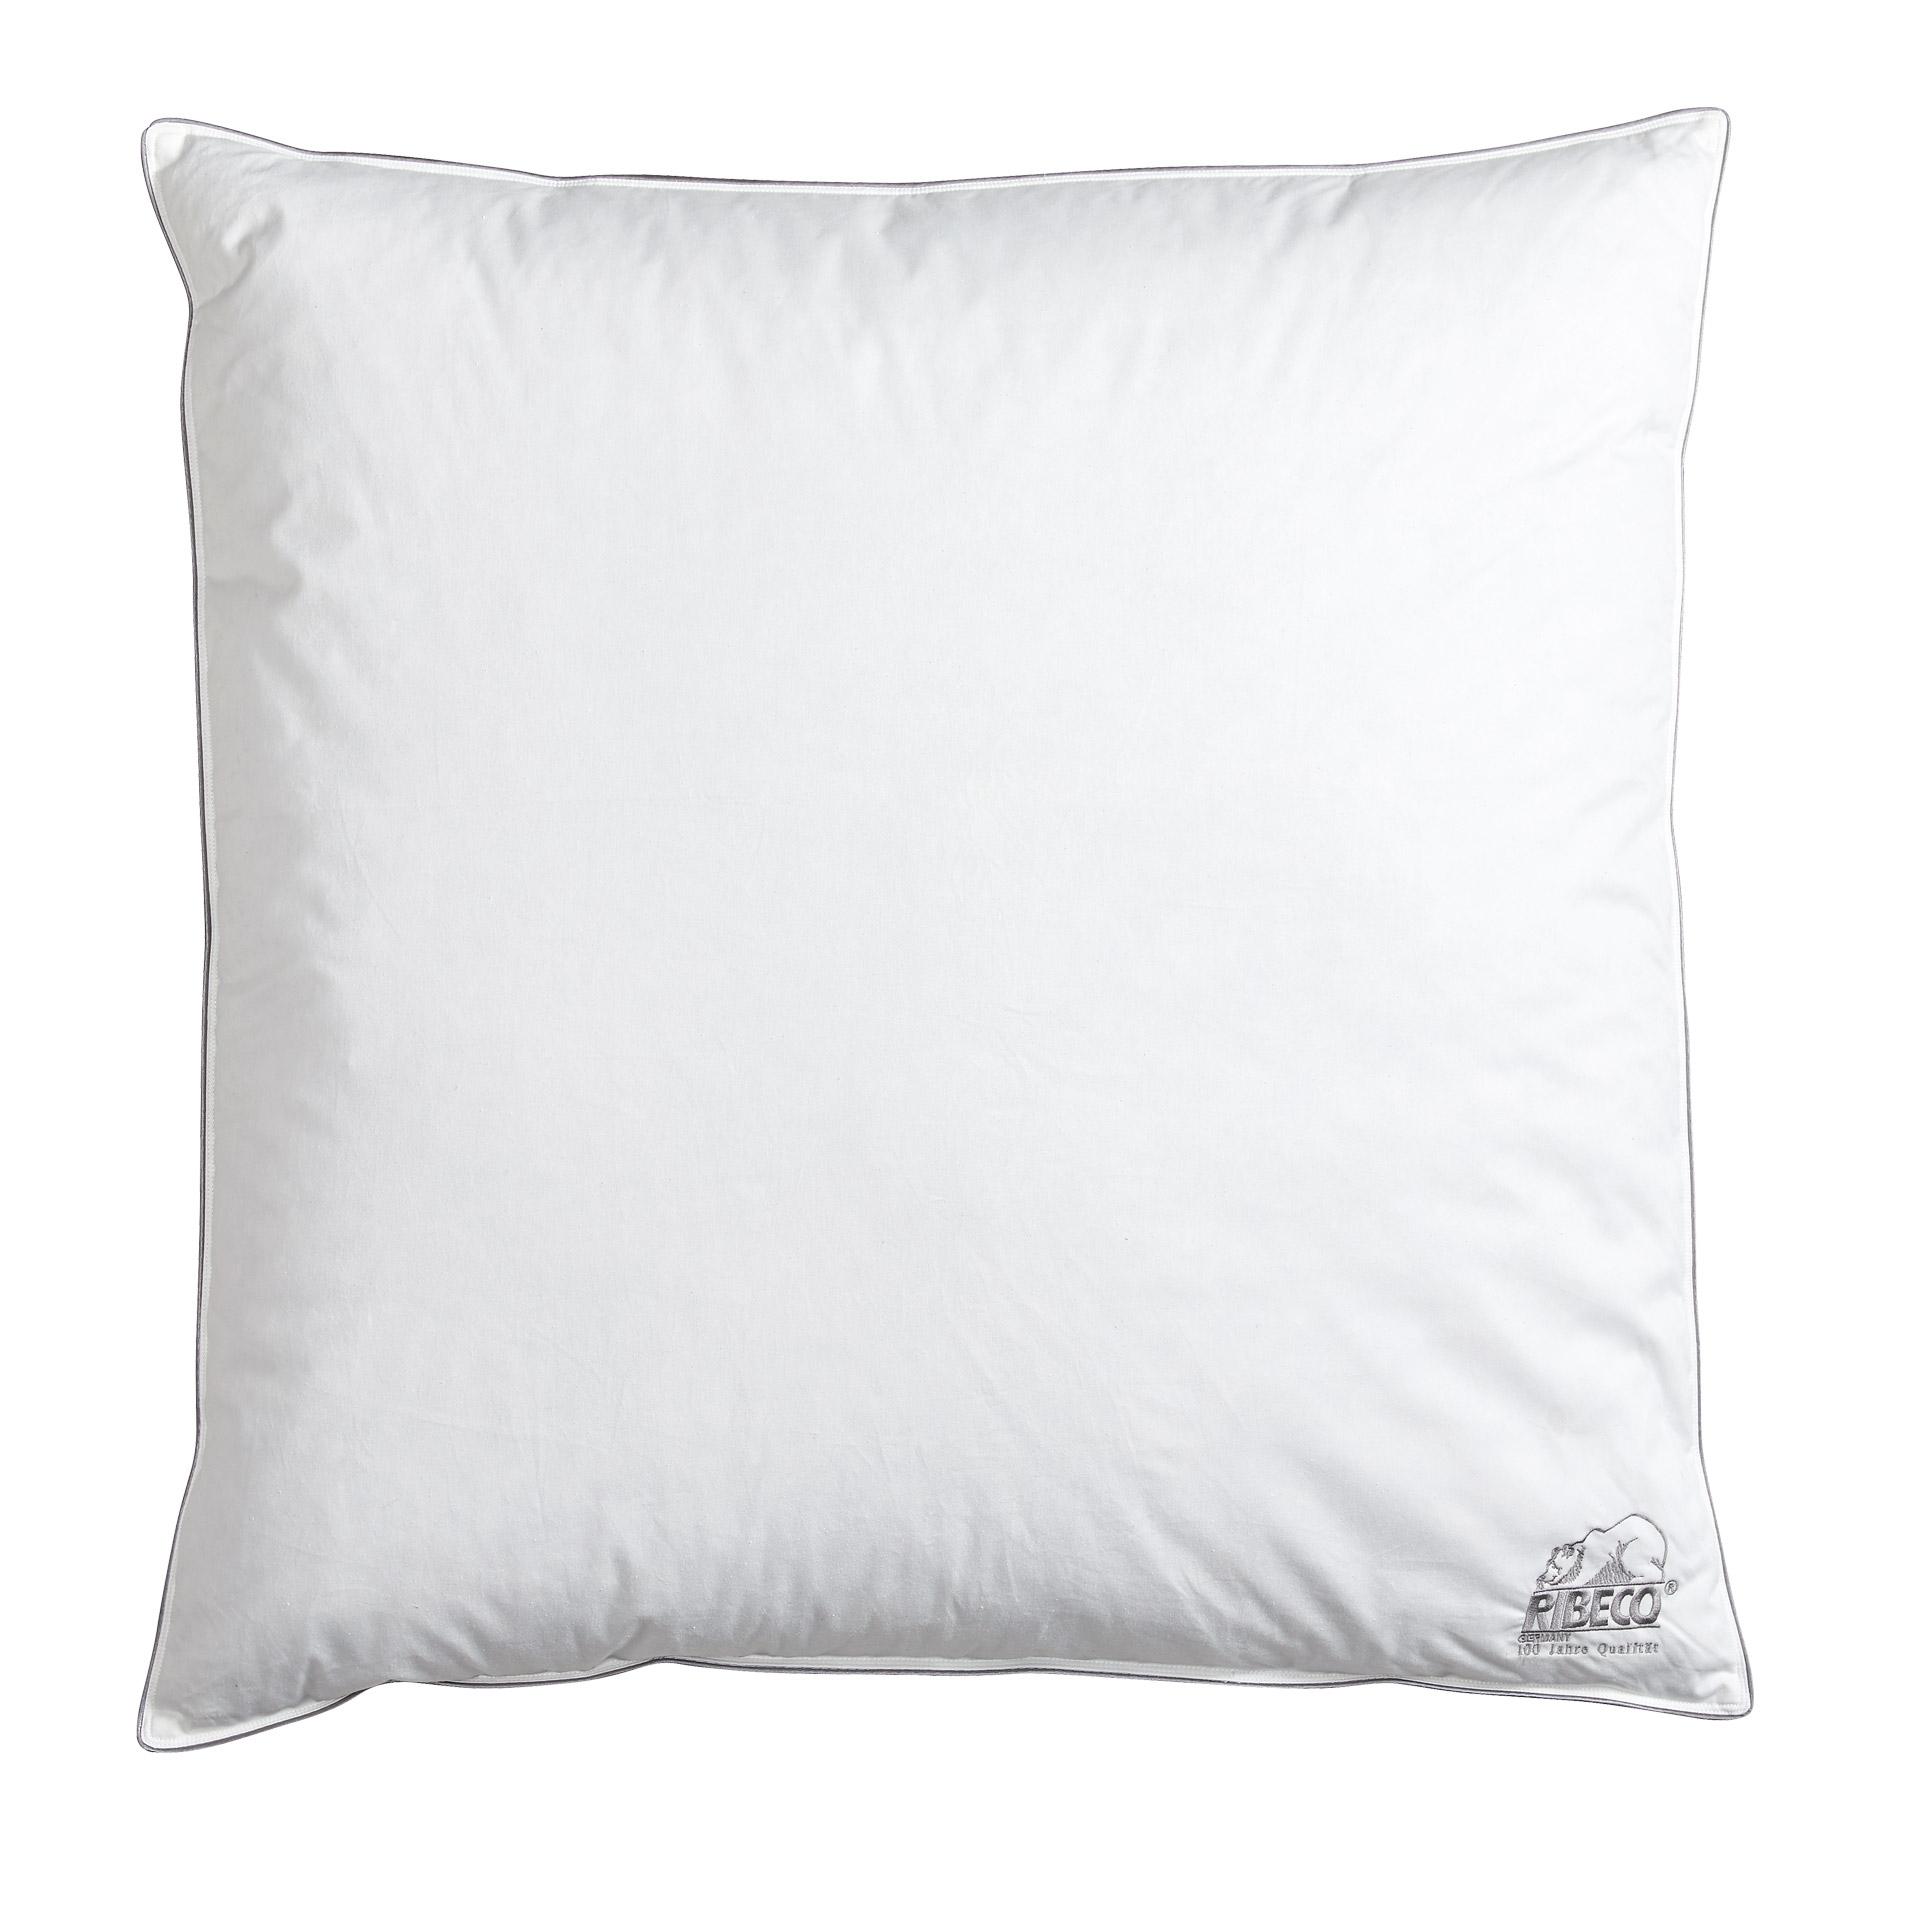 RIBECO® Federkopfkissen (80x80, weiß, 900g)